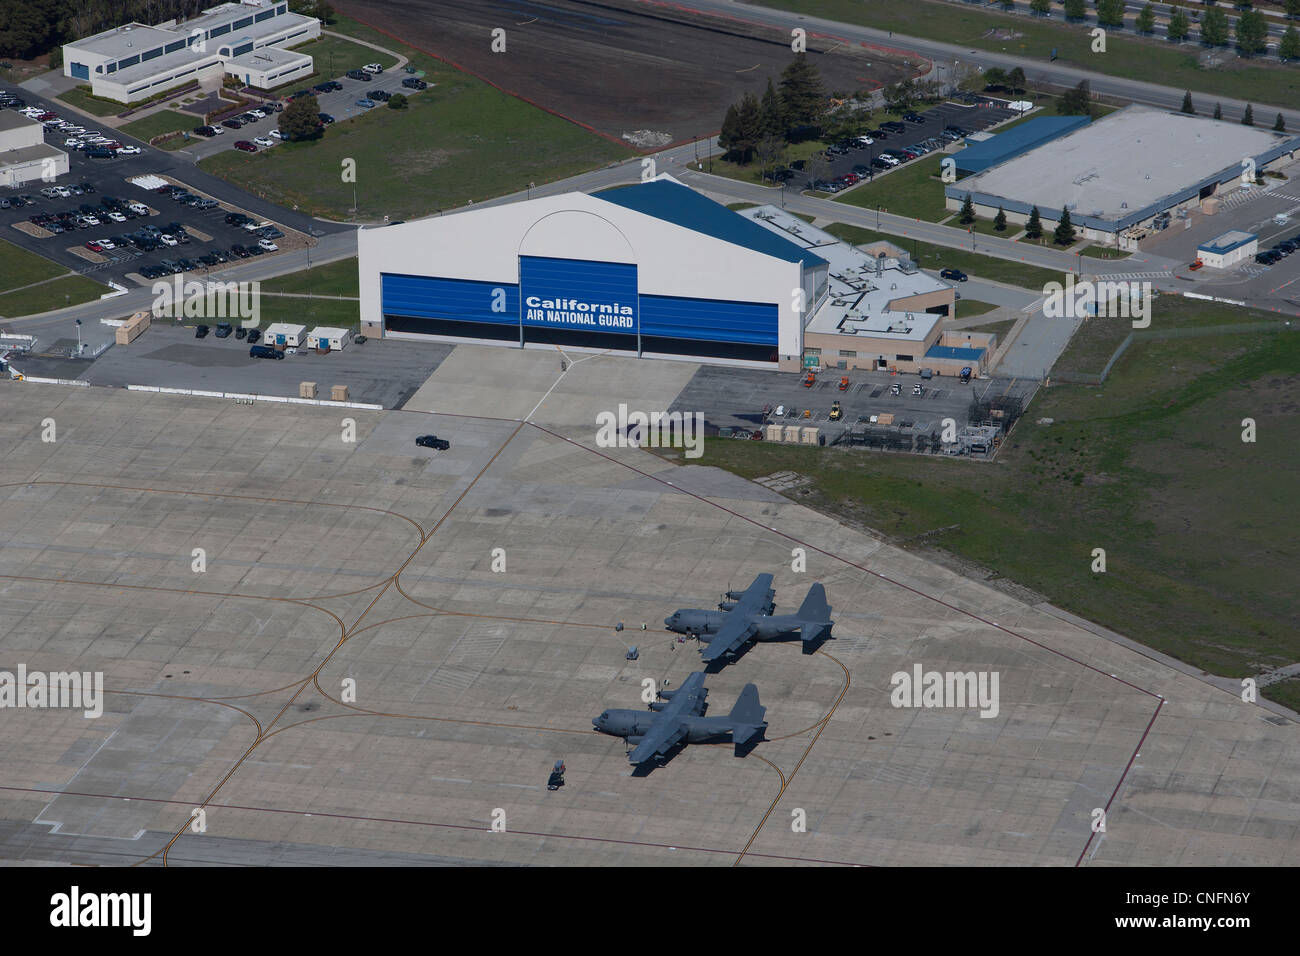 Fotografía aérea de la Guardia Aérea Nacional de California Moffett Field, Mountain View, California Imagen De Stock